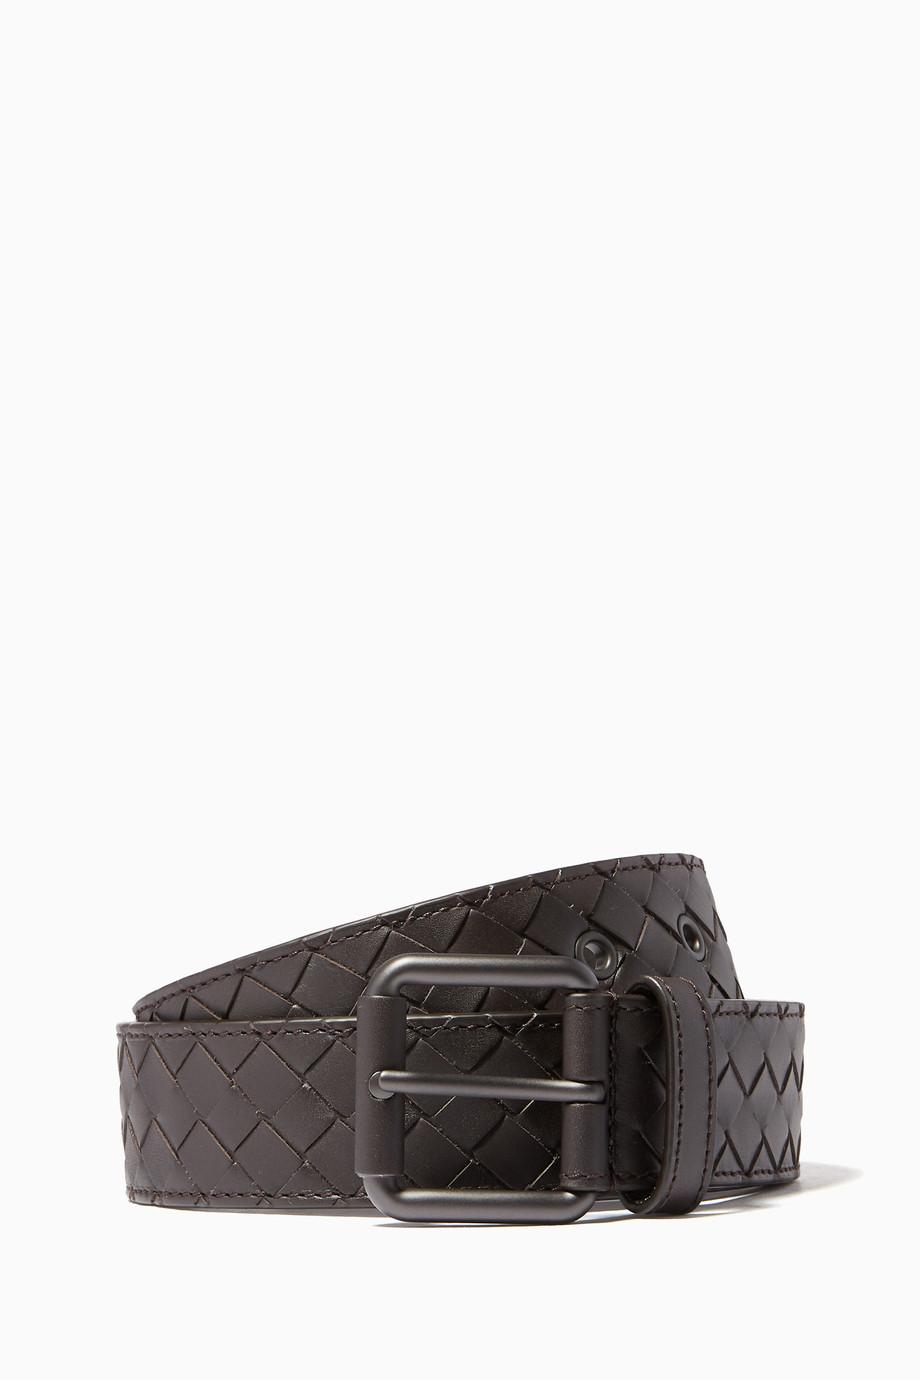 989c65fcf5fe Shop Bottega Veneta Brown Espresso Intrecciato Leather Belt for Men ...